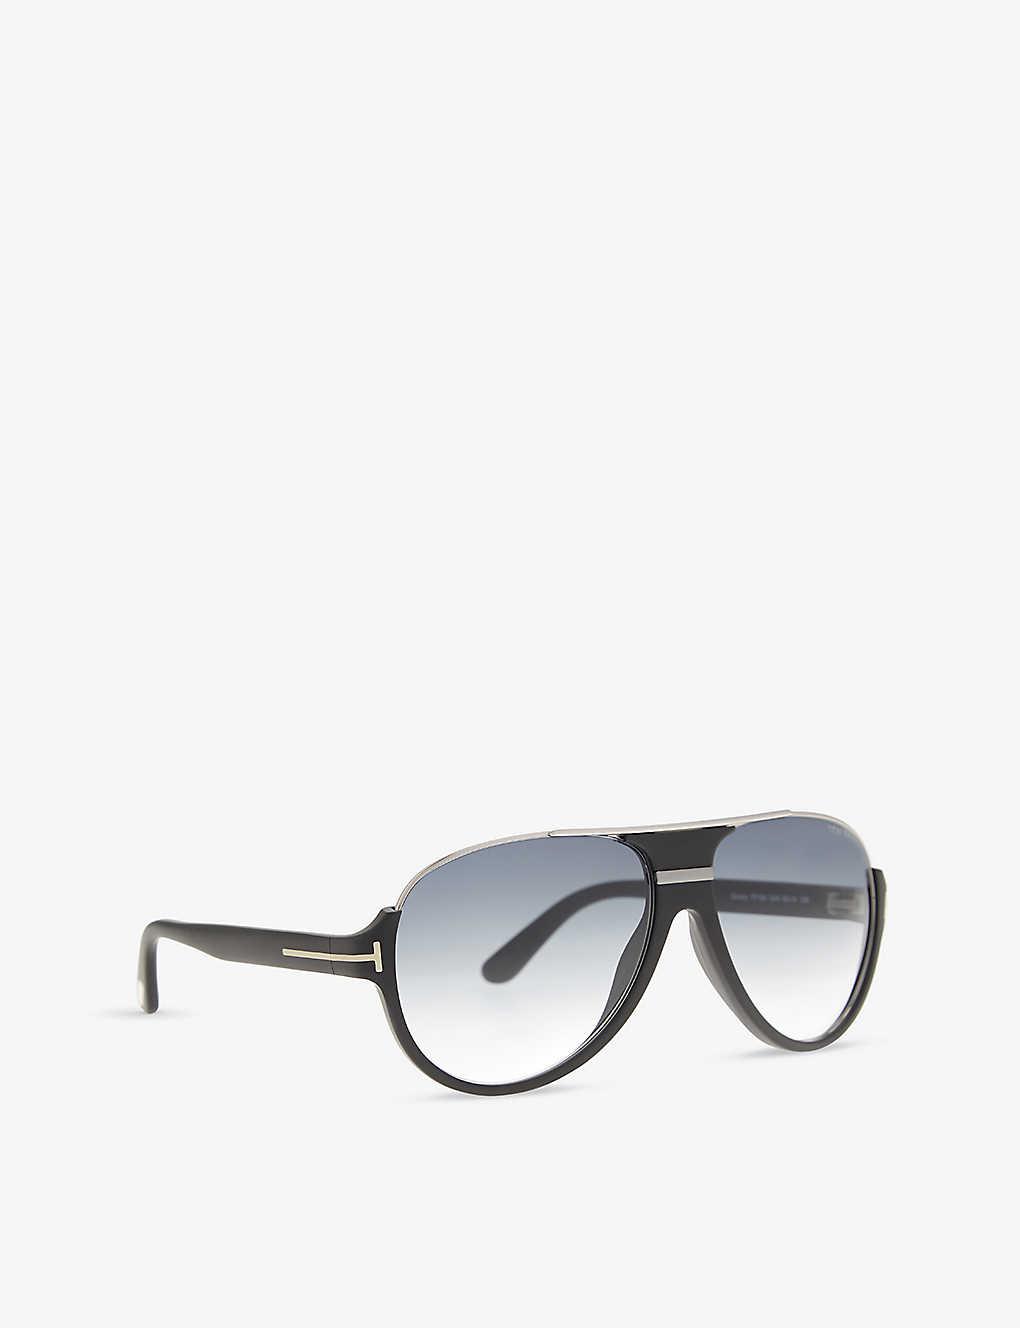 5c8c0ce2116ab ... Dimitry aviator sunglasses - Black matte